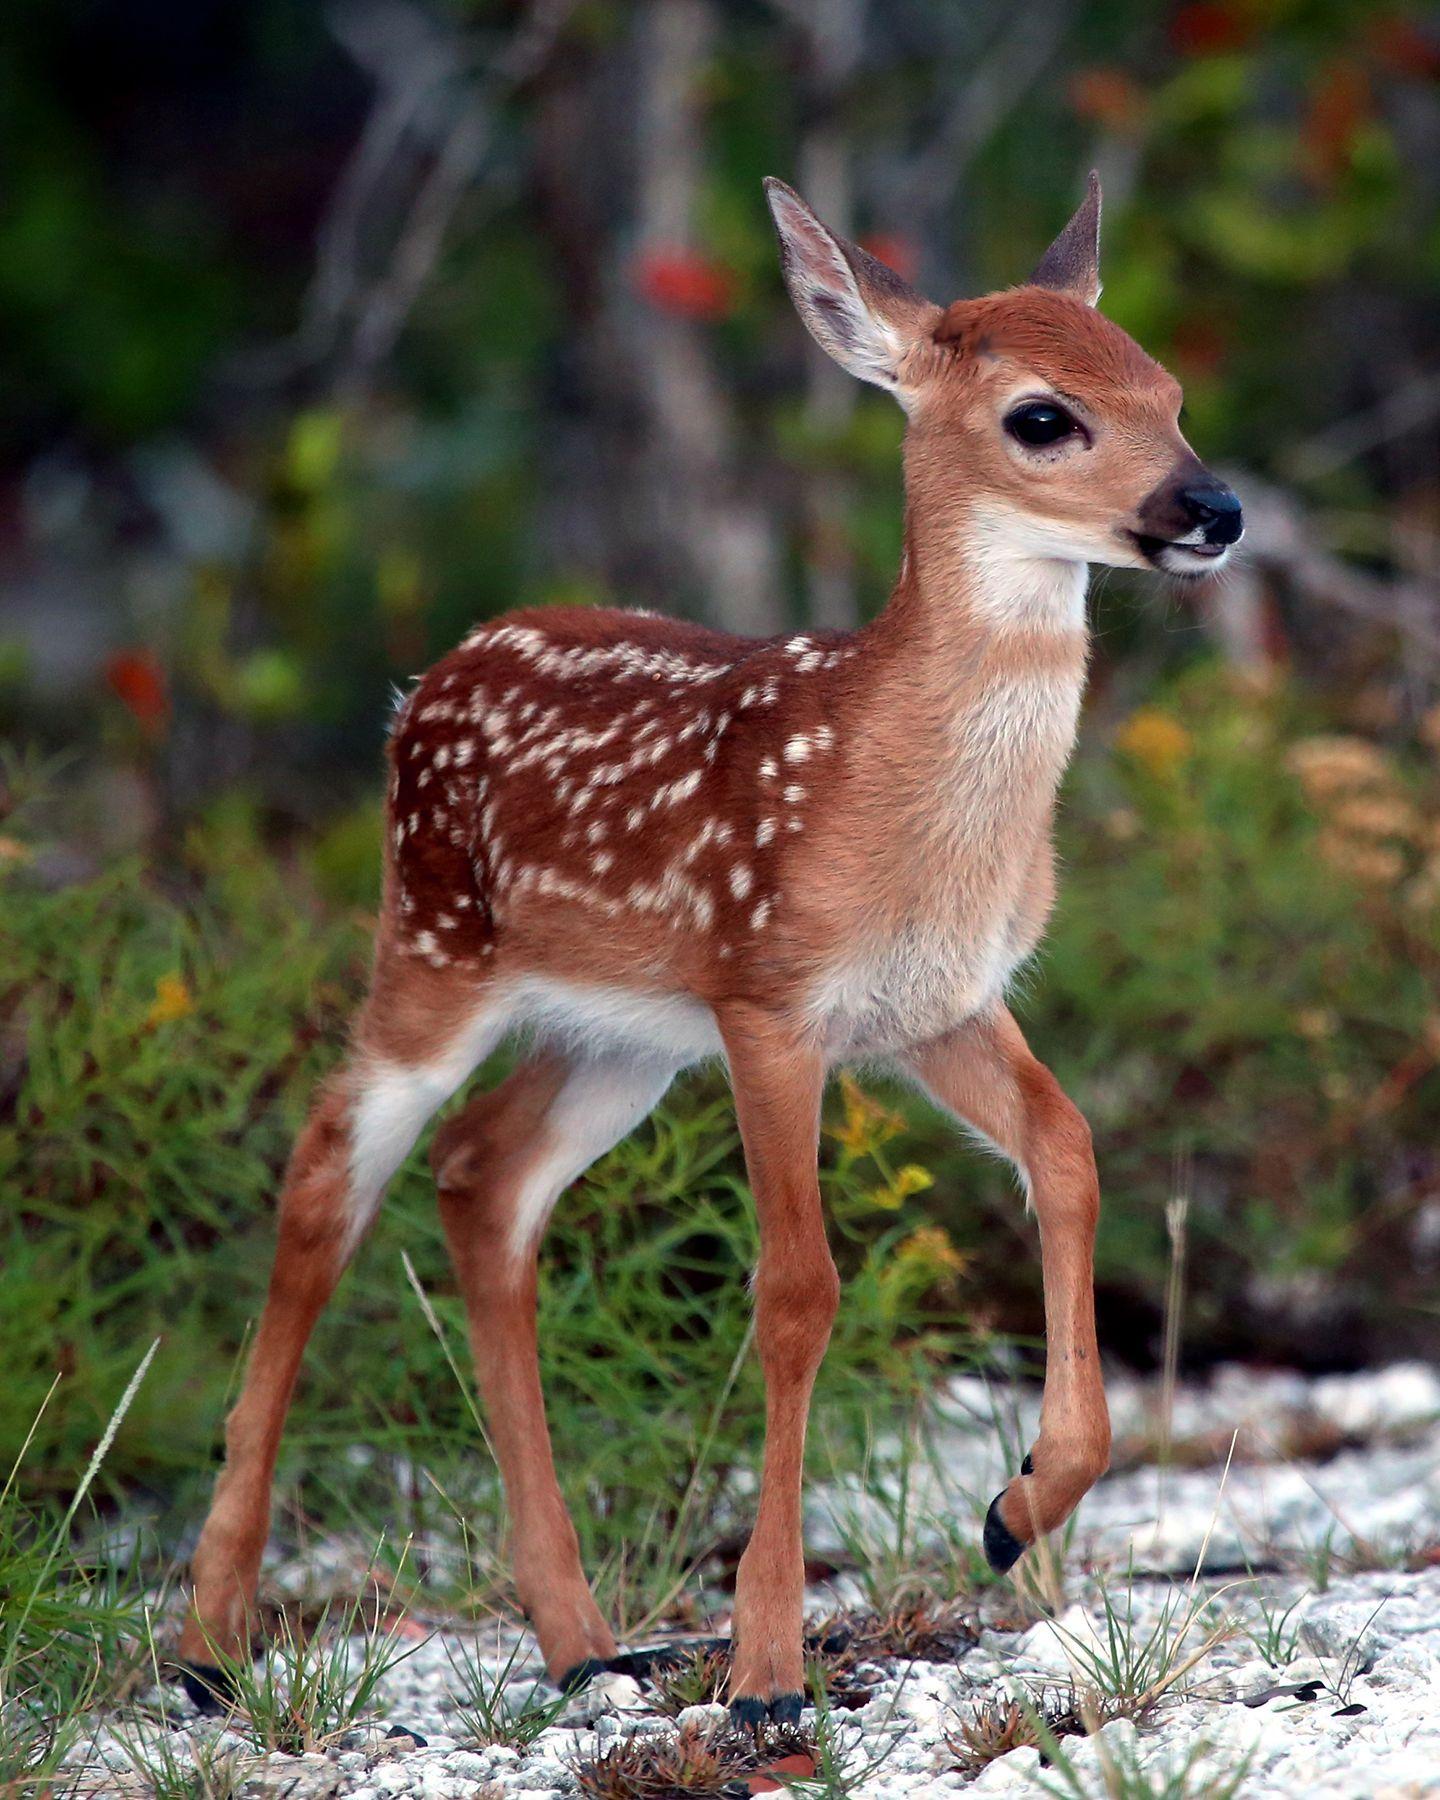 Refuge Manager Key Deer Screwworm Threat Appears Over But